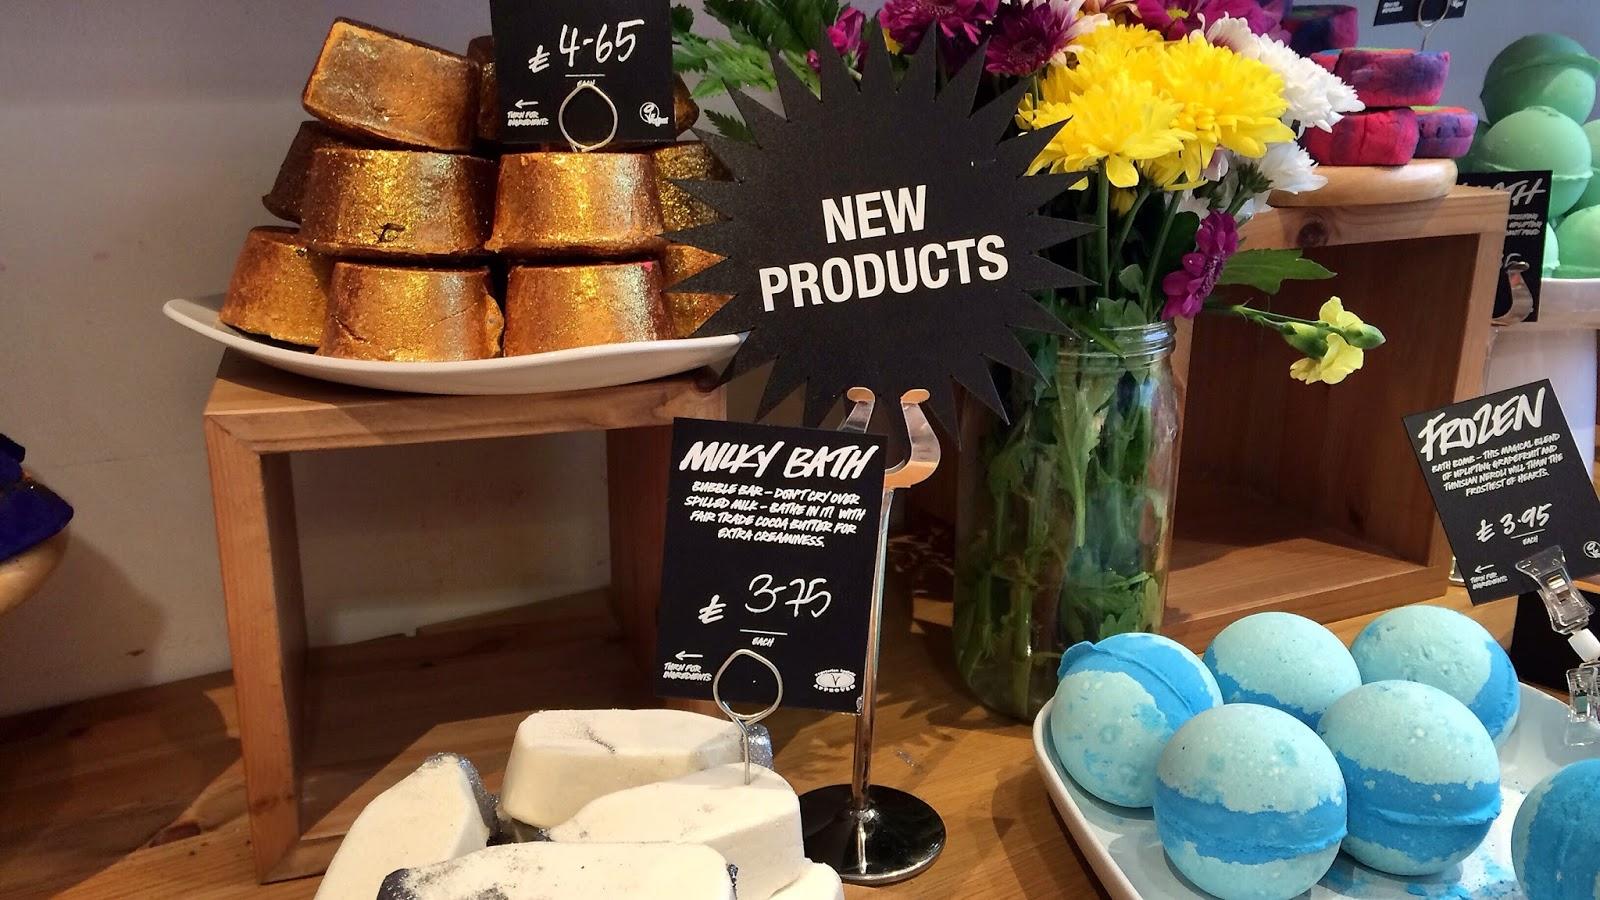 Lush Leicester bath natural organic fair trade frozen bath bomb